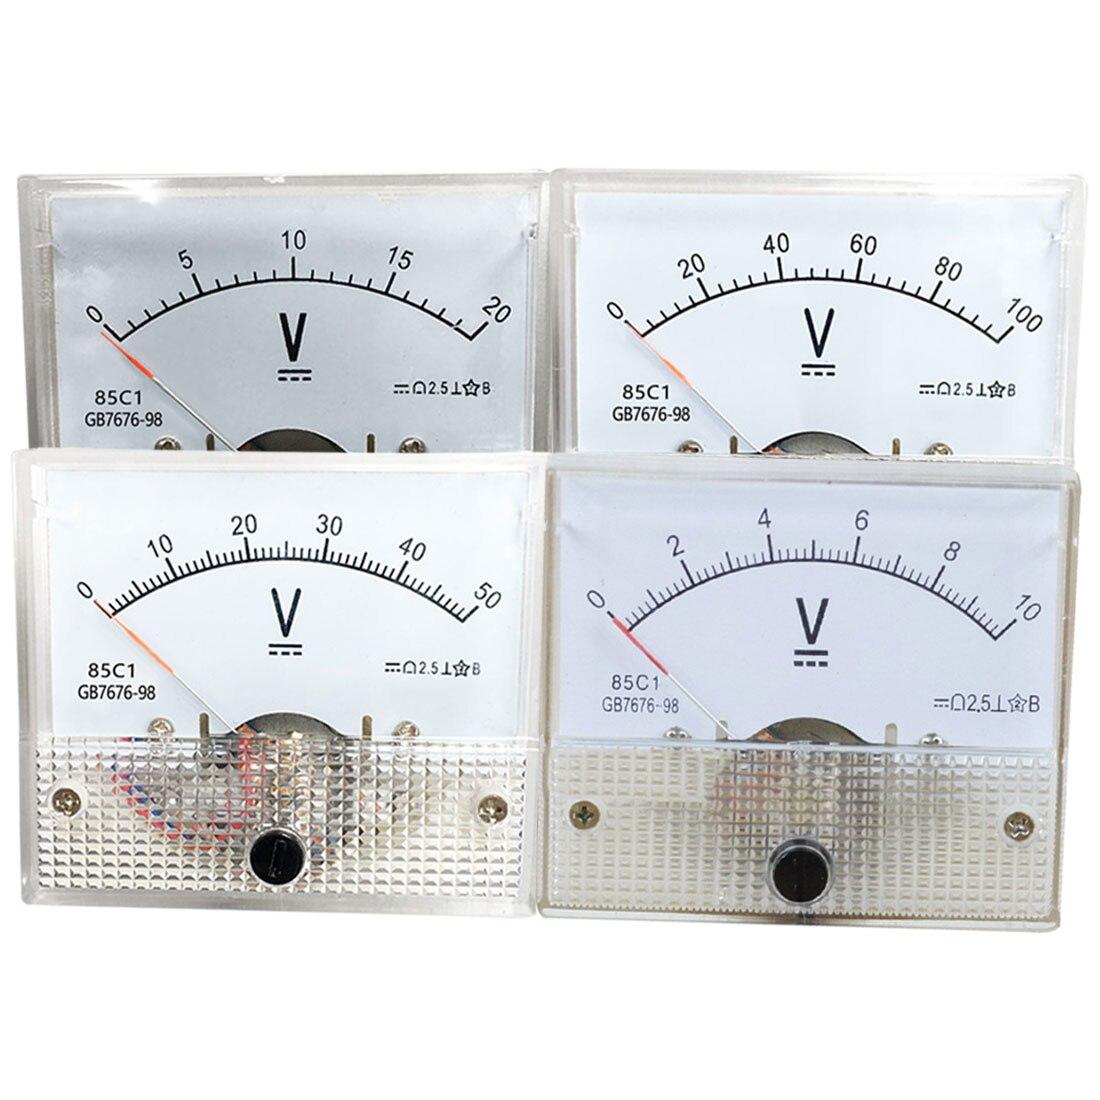 Analógico Painel Volt Voltage Meter Voltímetro Medidor 85C1 DC 10/20/30/50/100/200 v